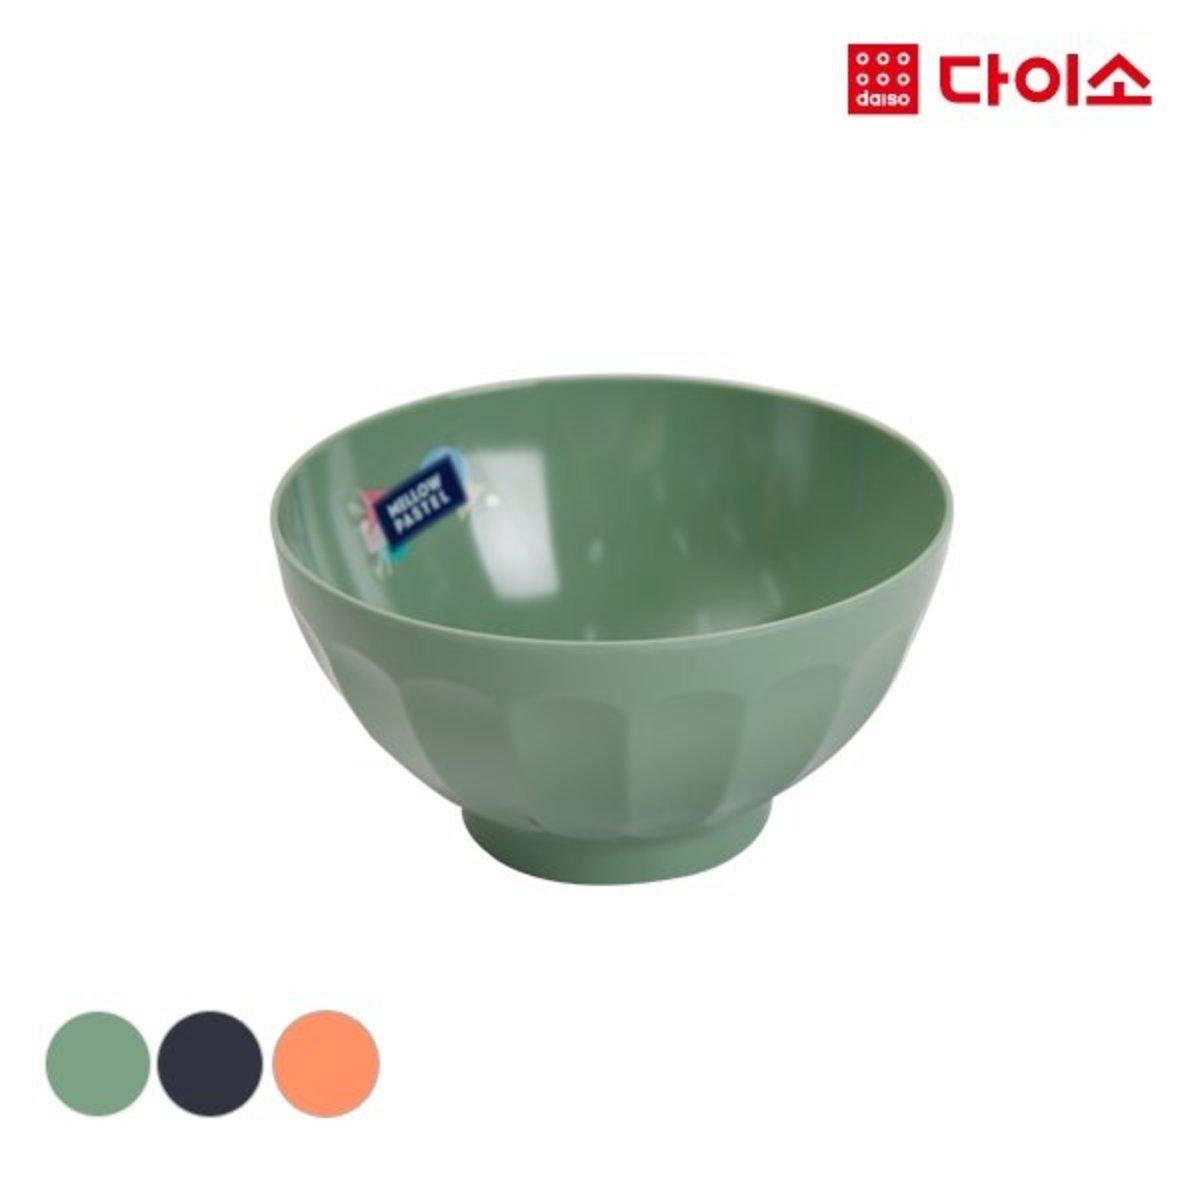 Plastic Rice Bowl - Navy